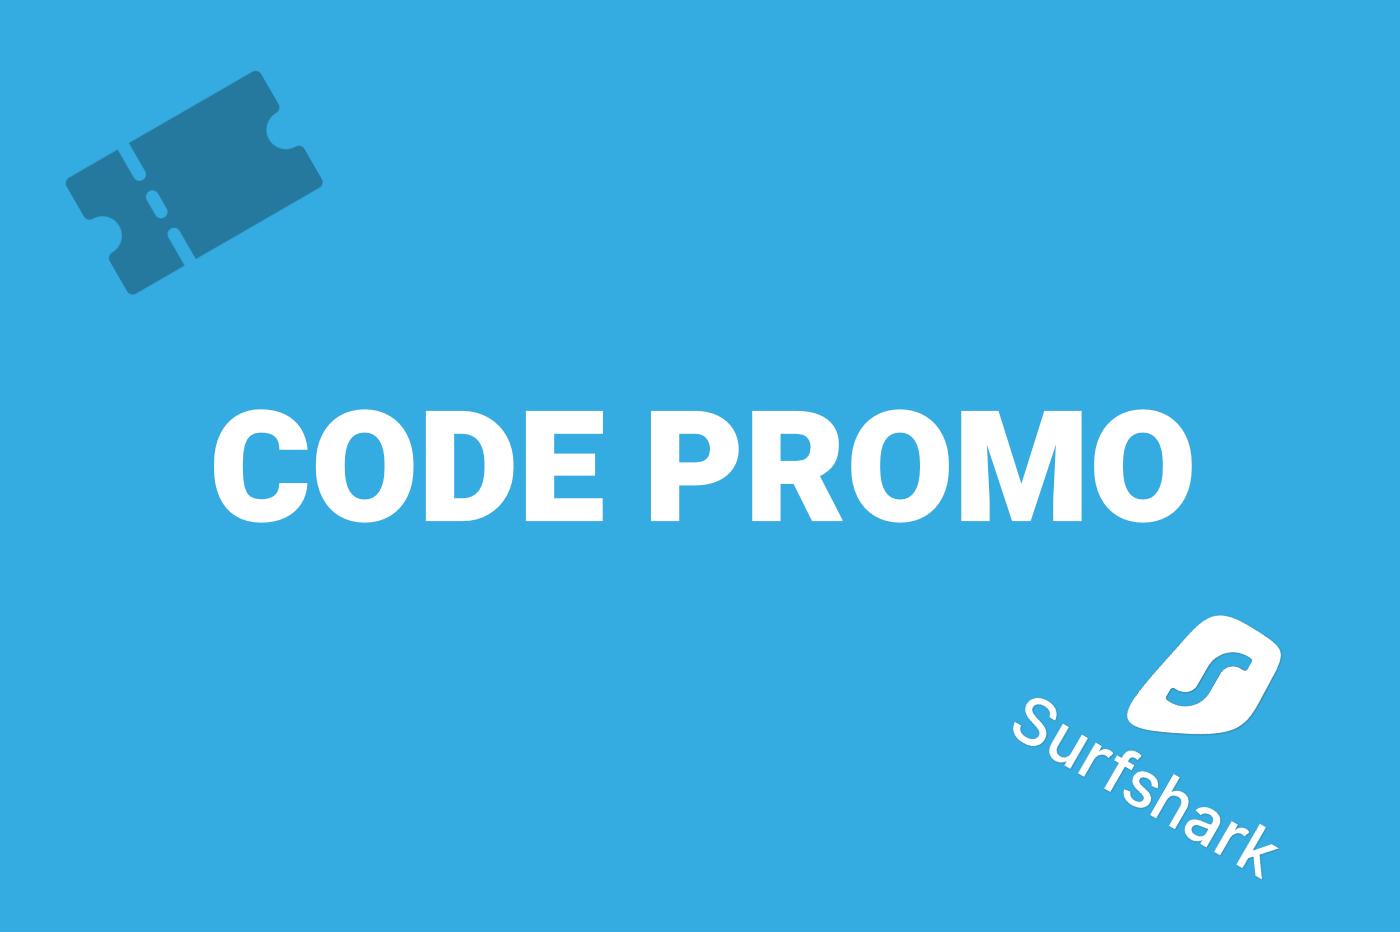 Code promo Surfshark